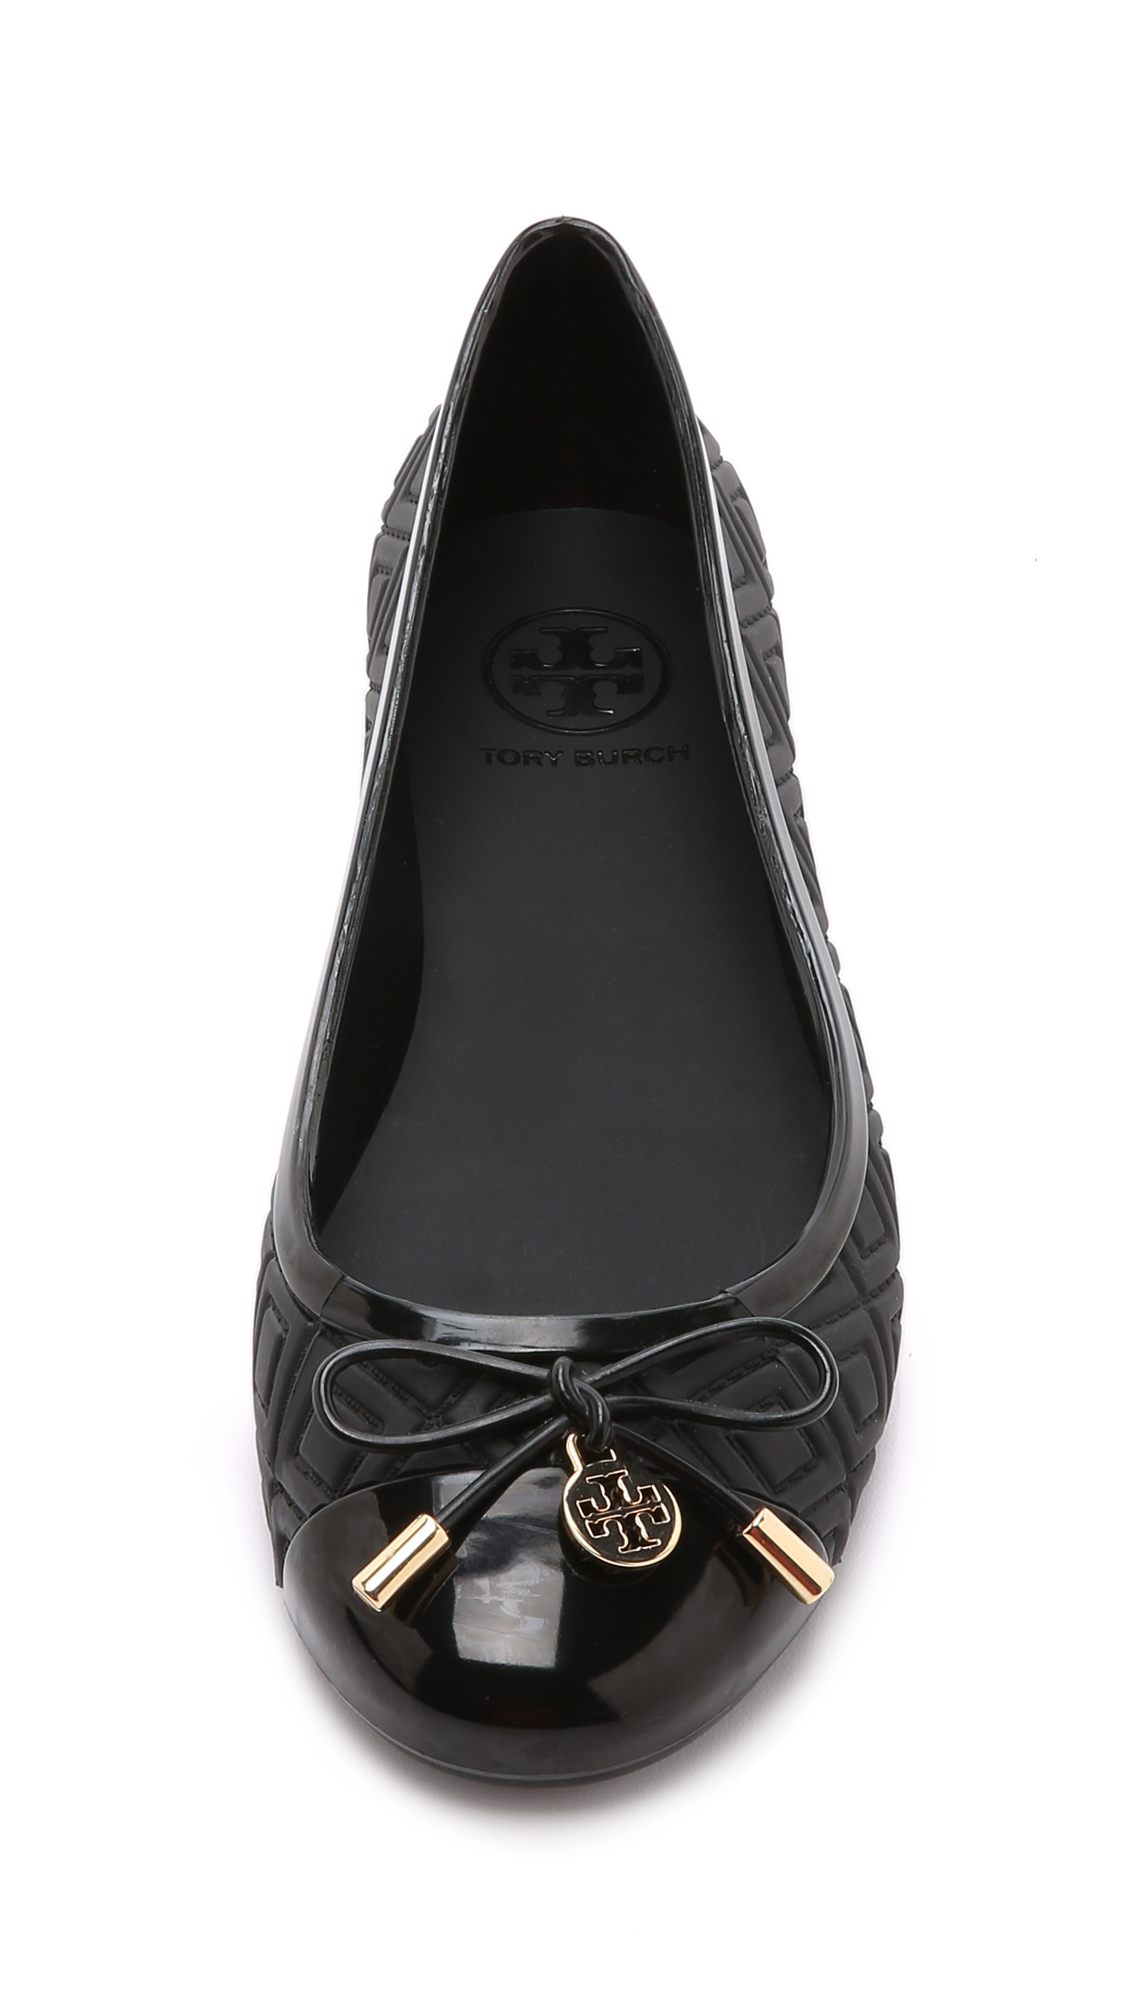 3c08846e1 ... sandal women 160f4 98823  closeout lyst tory burch jelly ballet flats  black in black cbf0e bf16e